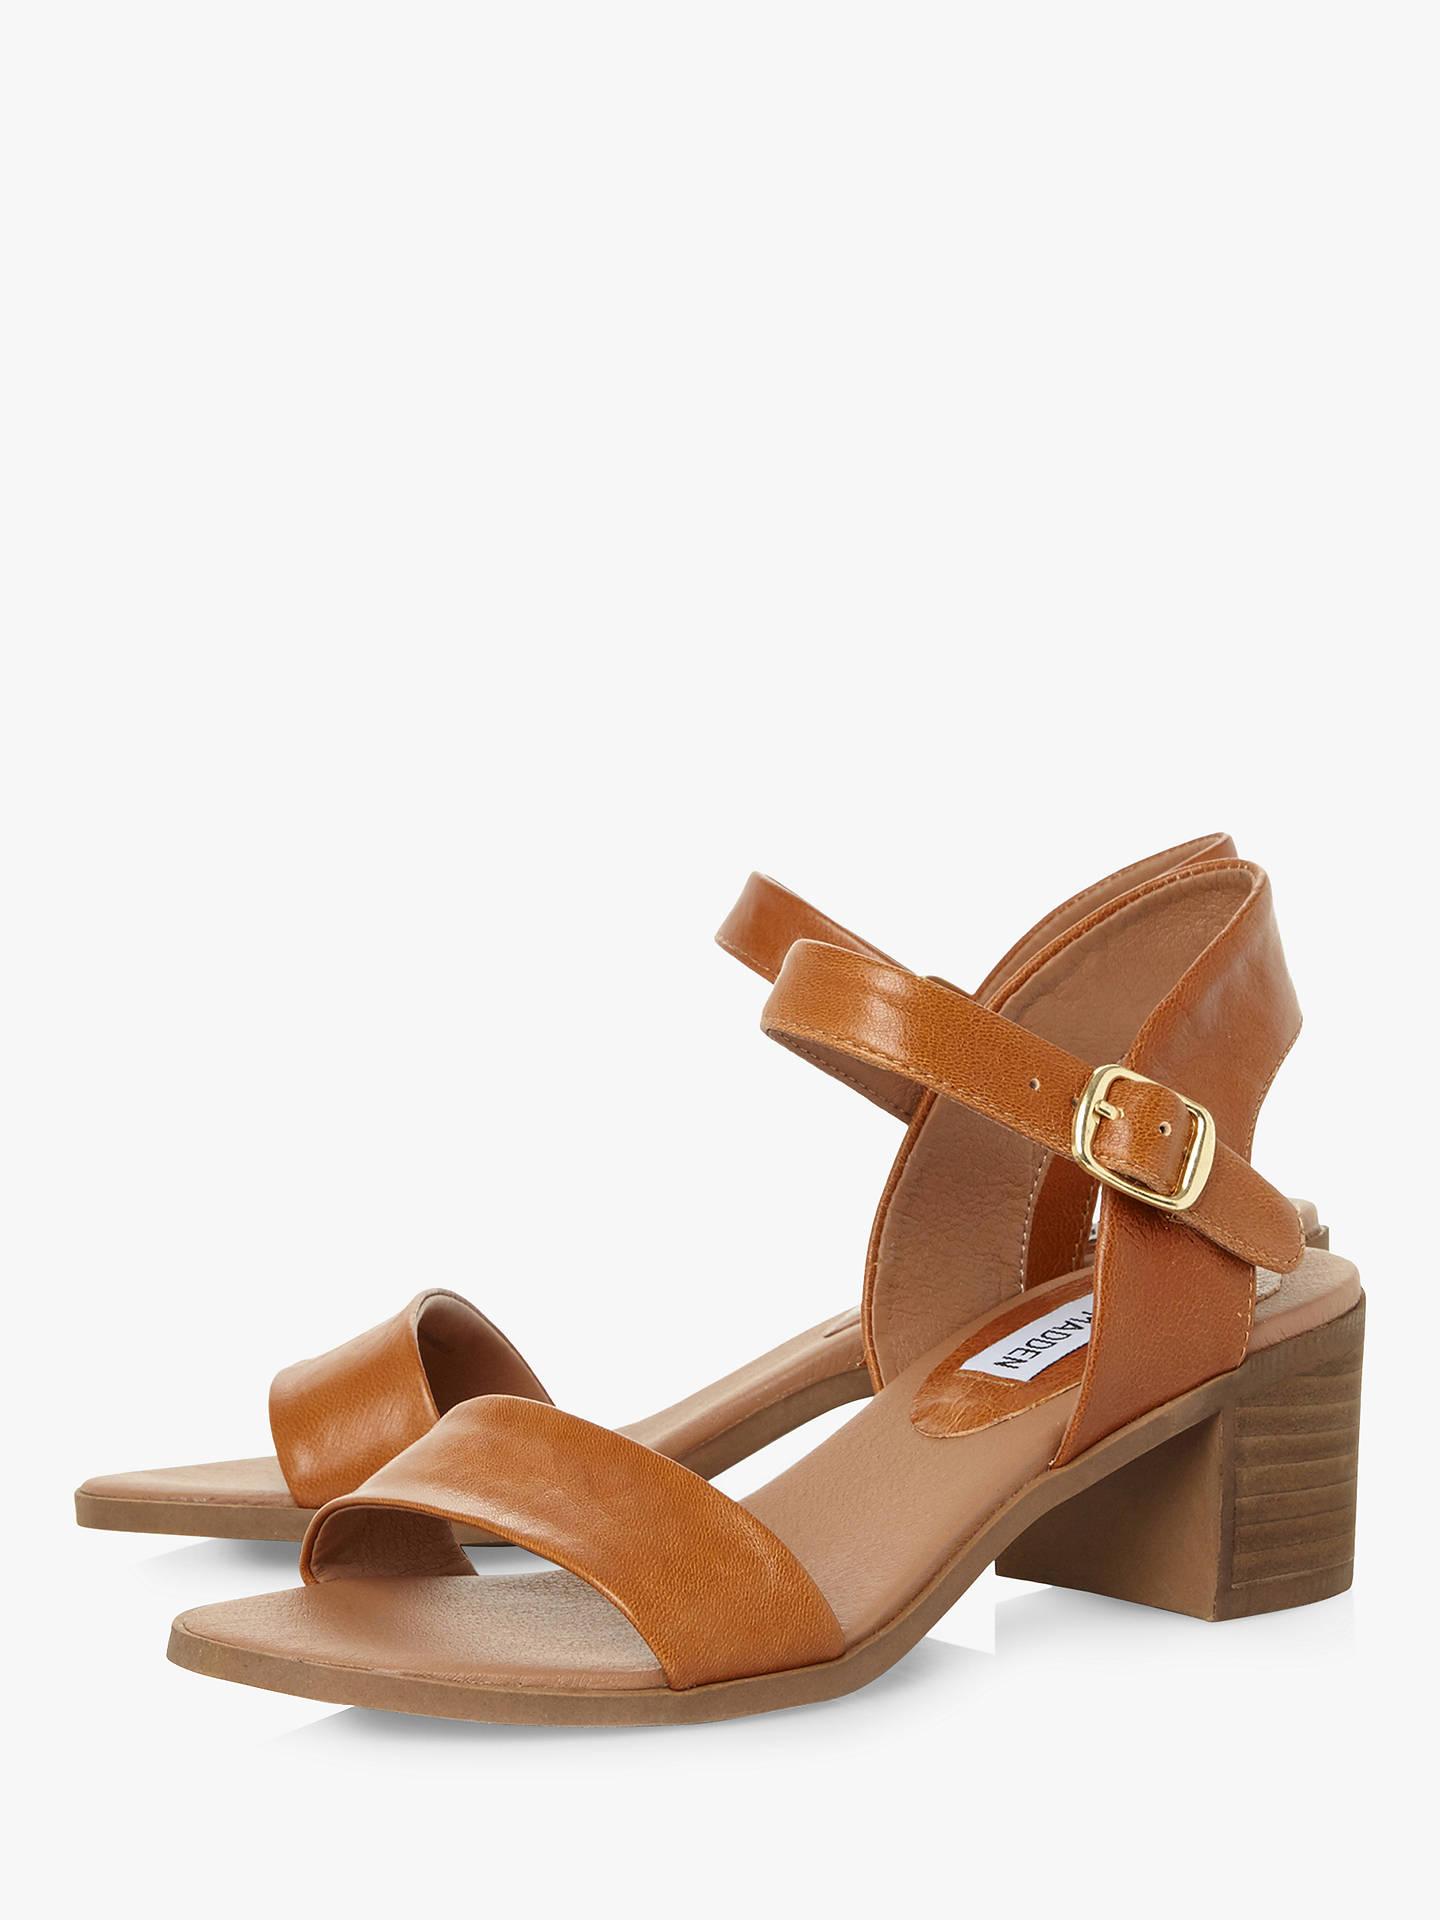 b27cfdc33922 Steve Madden April Leather Heeled Sandals at John Lewis   Partners